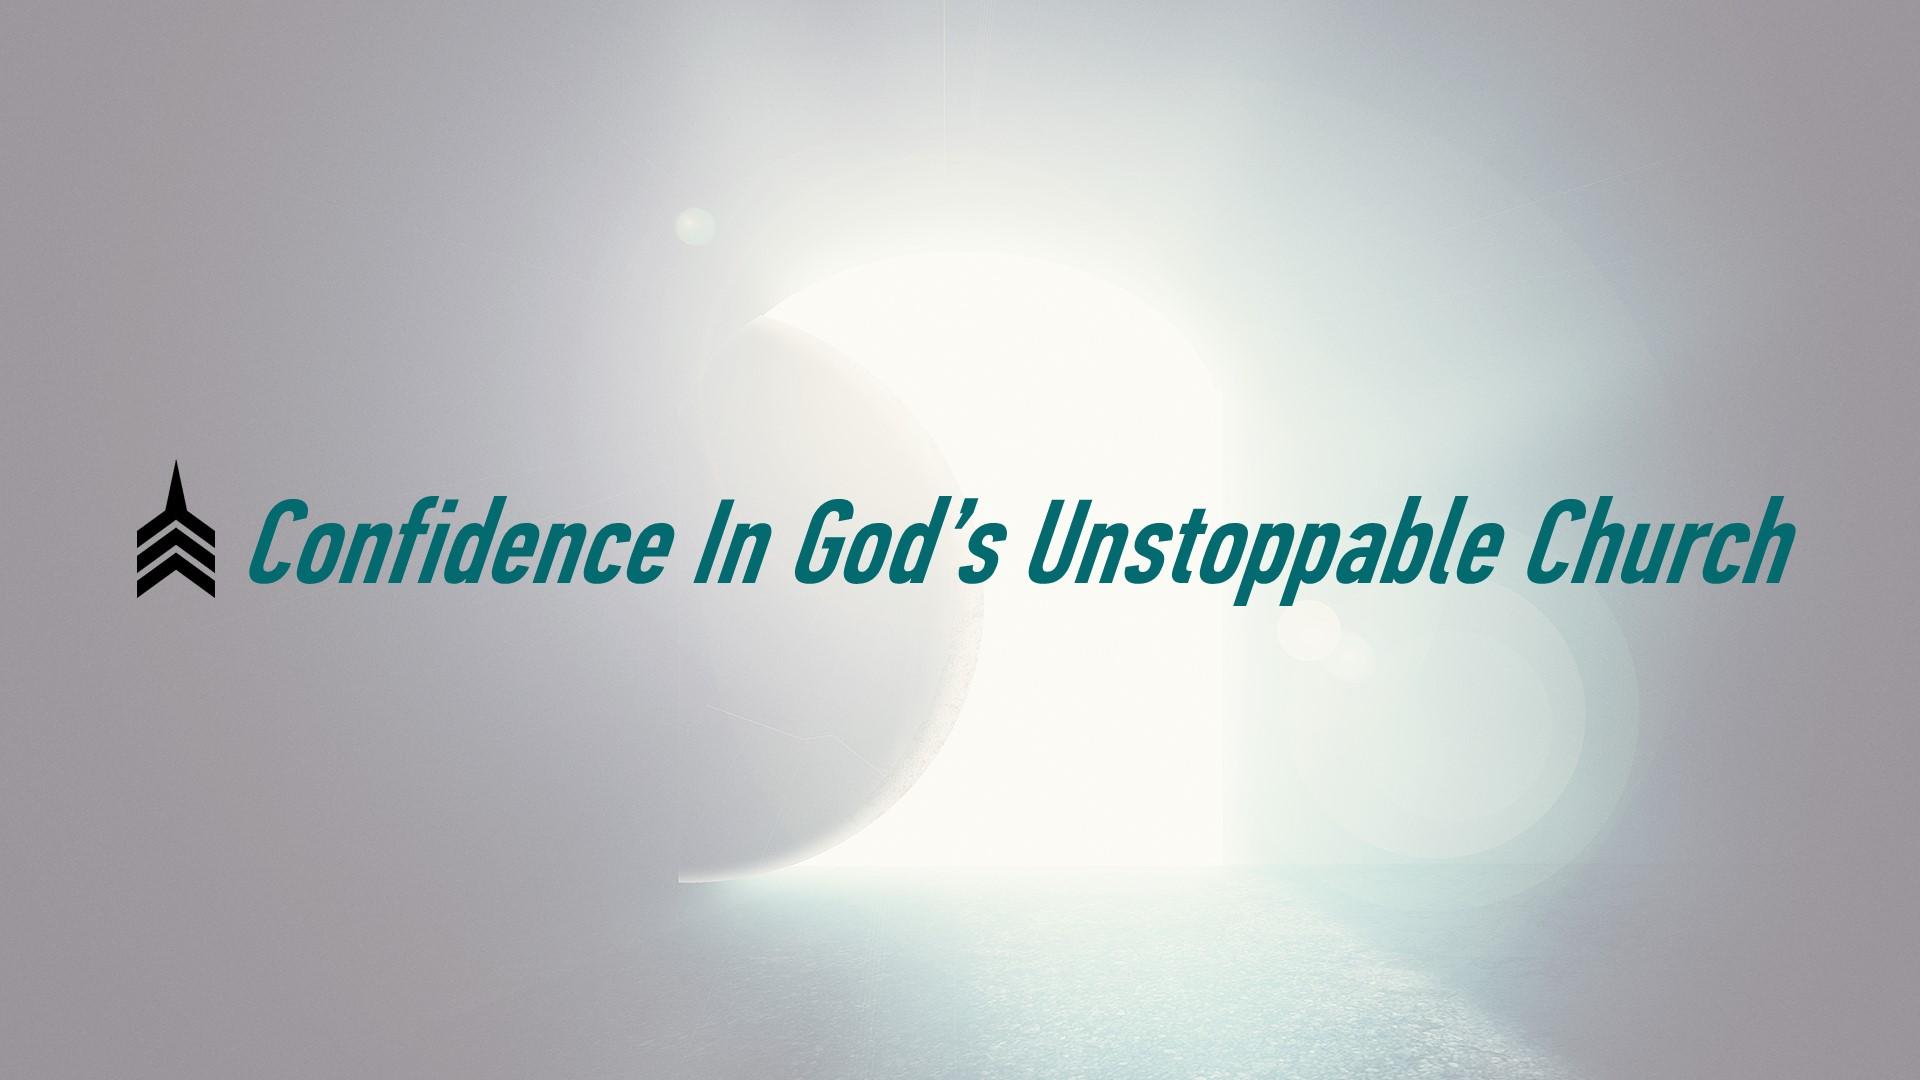 Confidence In God's Unstoppable Church.JPG